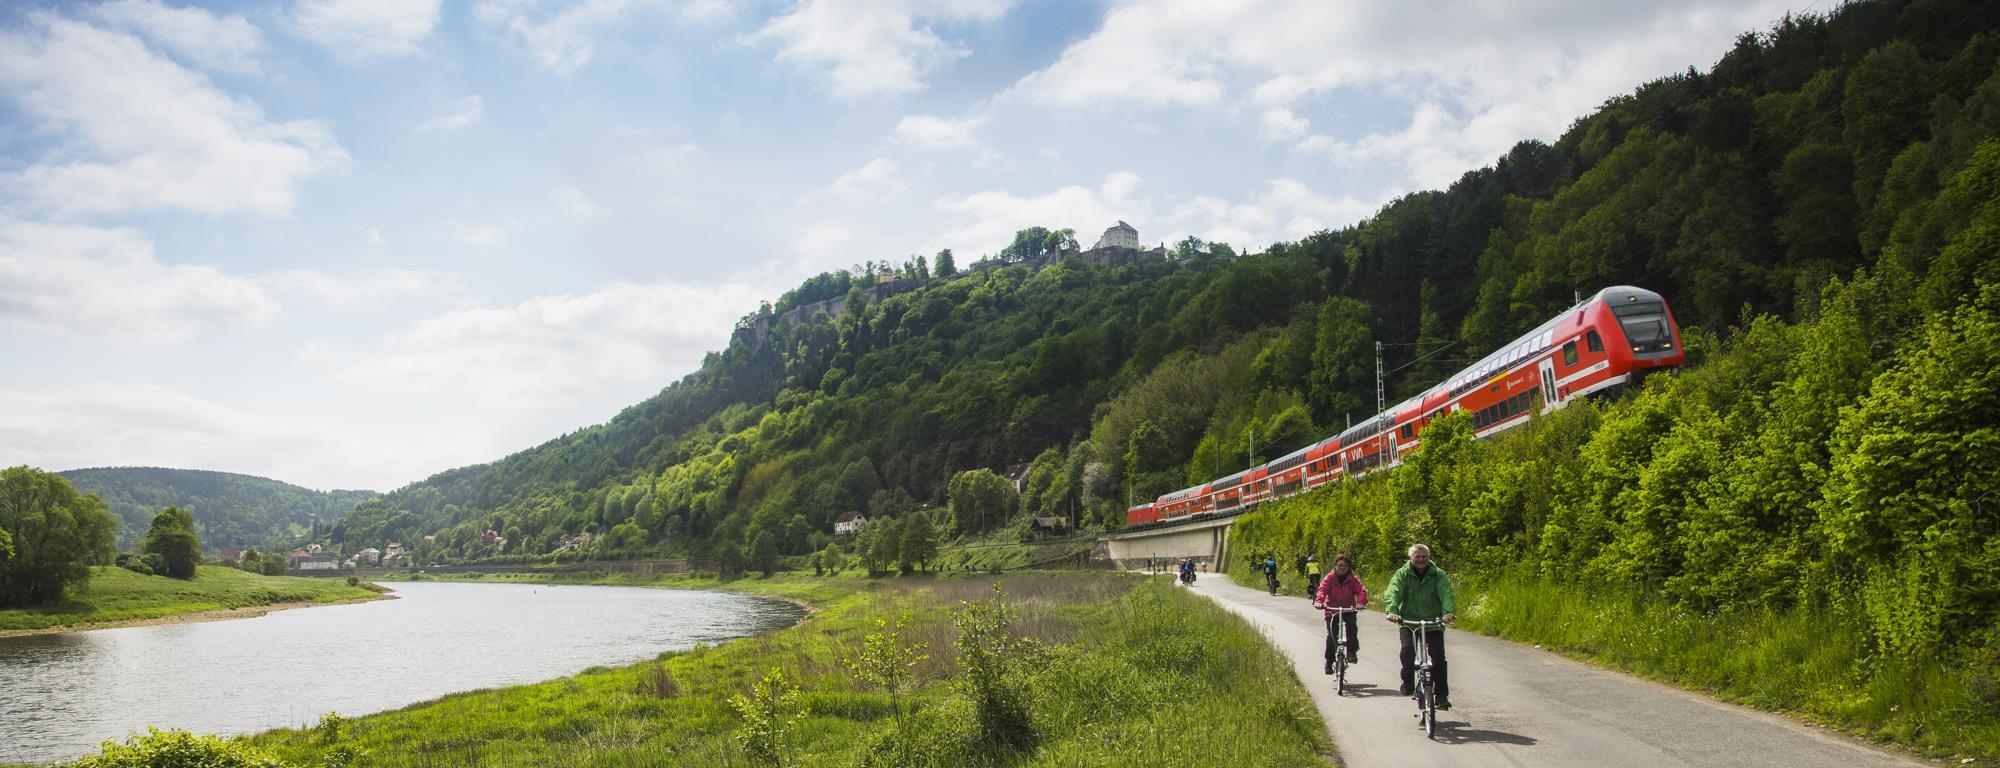 Königstein, Saksonia, trasa rowerowa